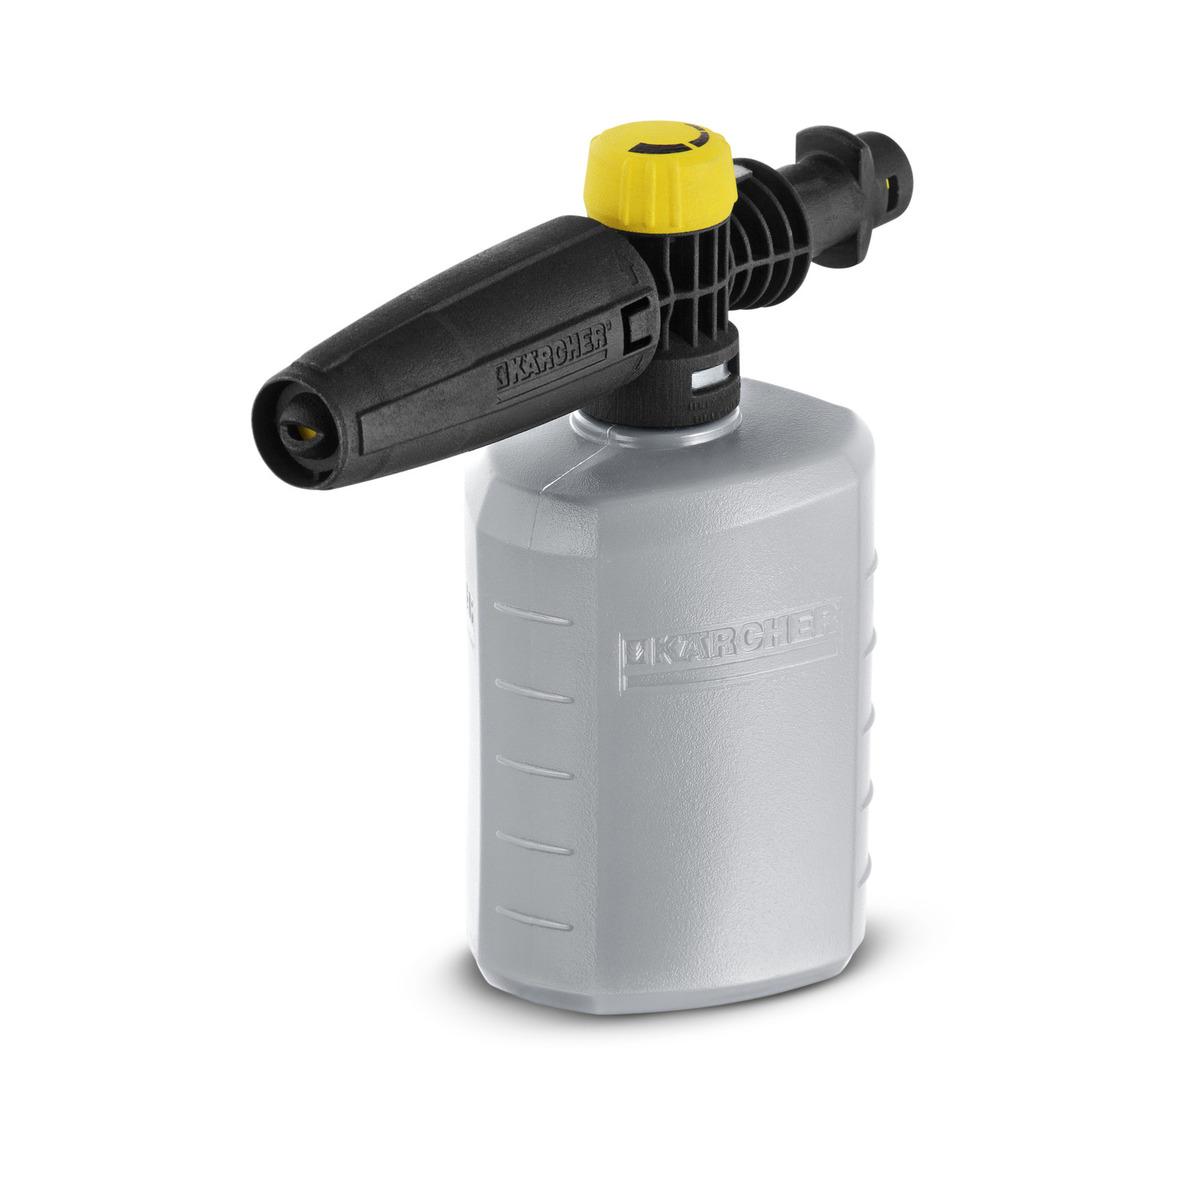 FJ 6 foam nozzle